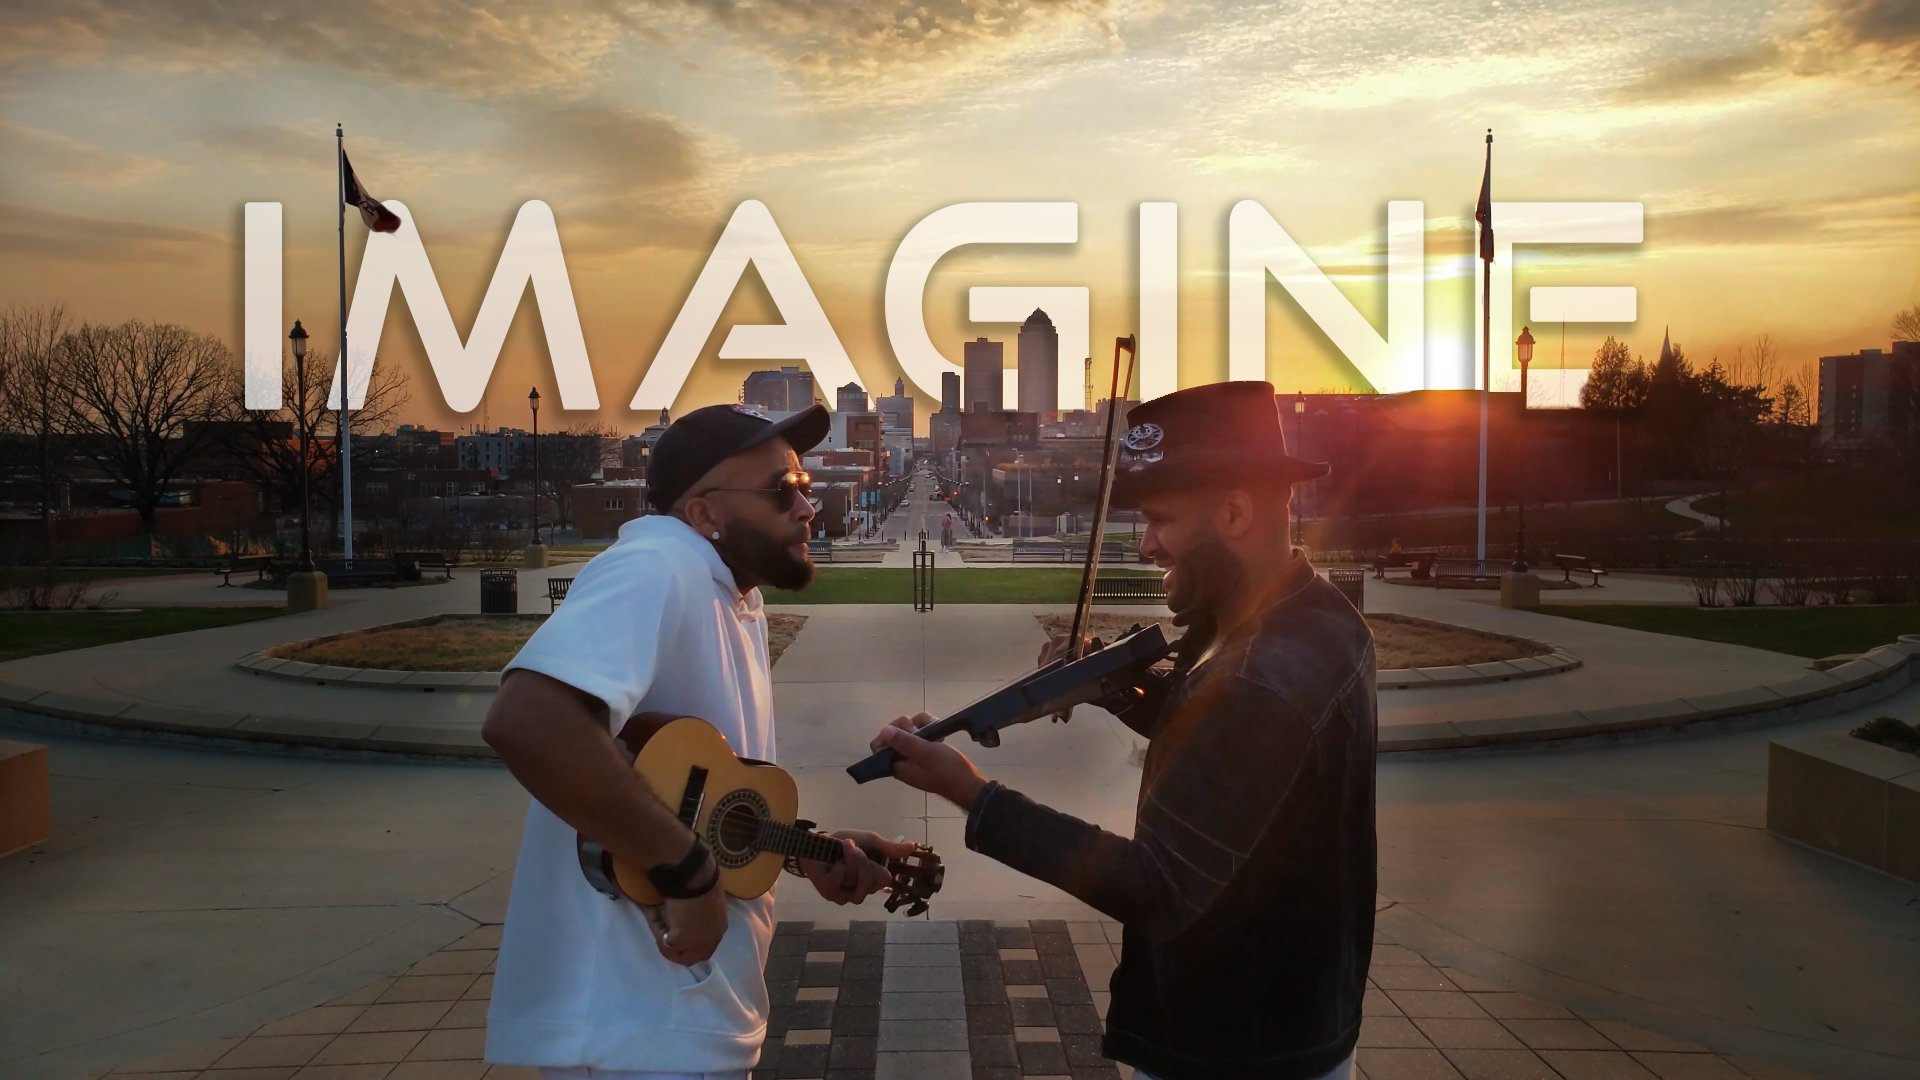 imagine john lennon violin and ukulele cover b2wins